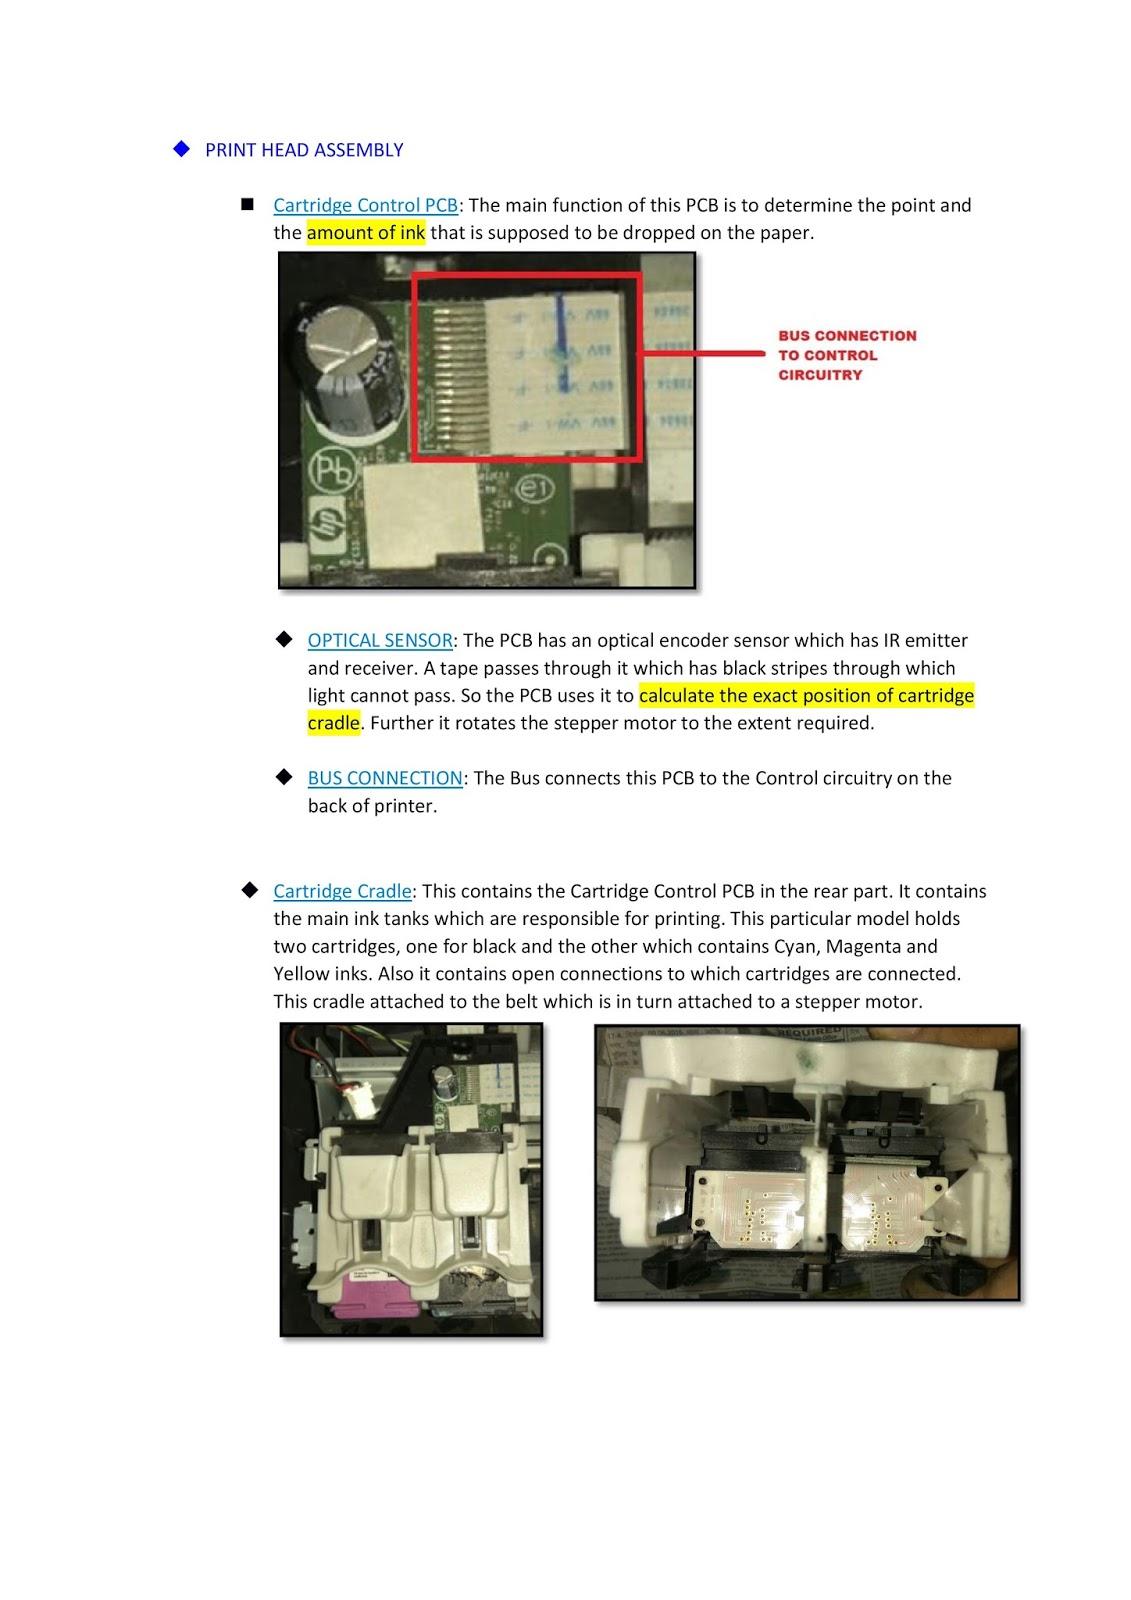 Iiitd Systems Management 2016 How Stuff Works 220v Led 2 Public Circuit Online Simulator Docircuits Sm Blog Inkjet Printers Work